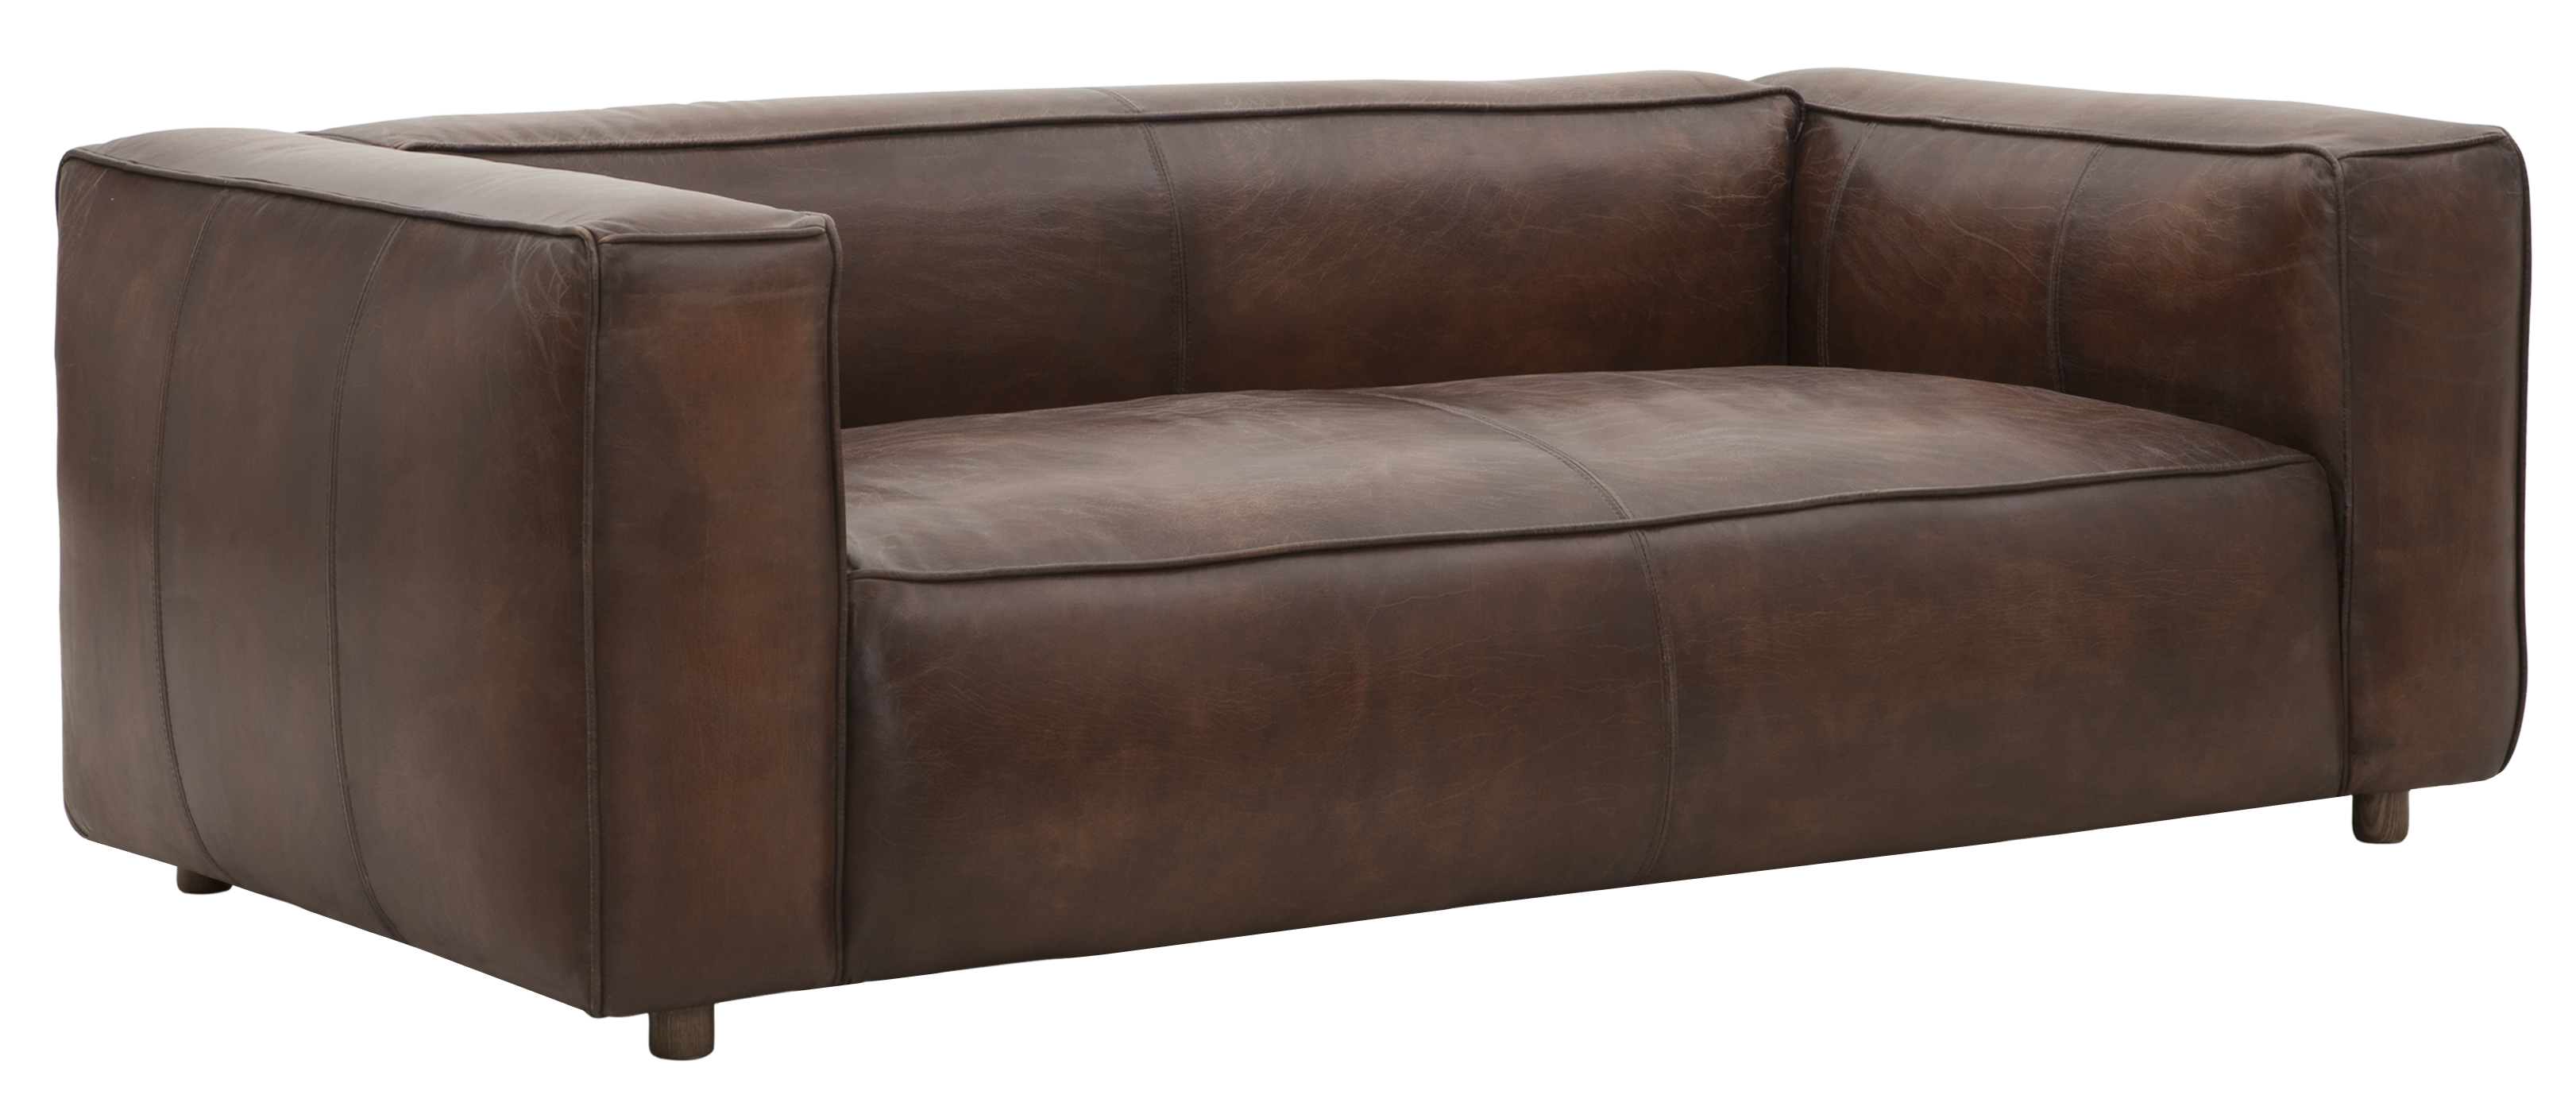 Brilliant 2 Sitzer Lounge Sofa 200 Cm Vintage Leder Manhattan Ledersofa Klassisch Modern Coffee Interior Design Ideas Greaswefileorg